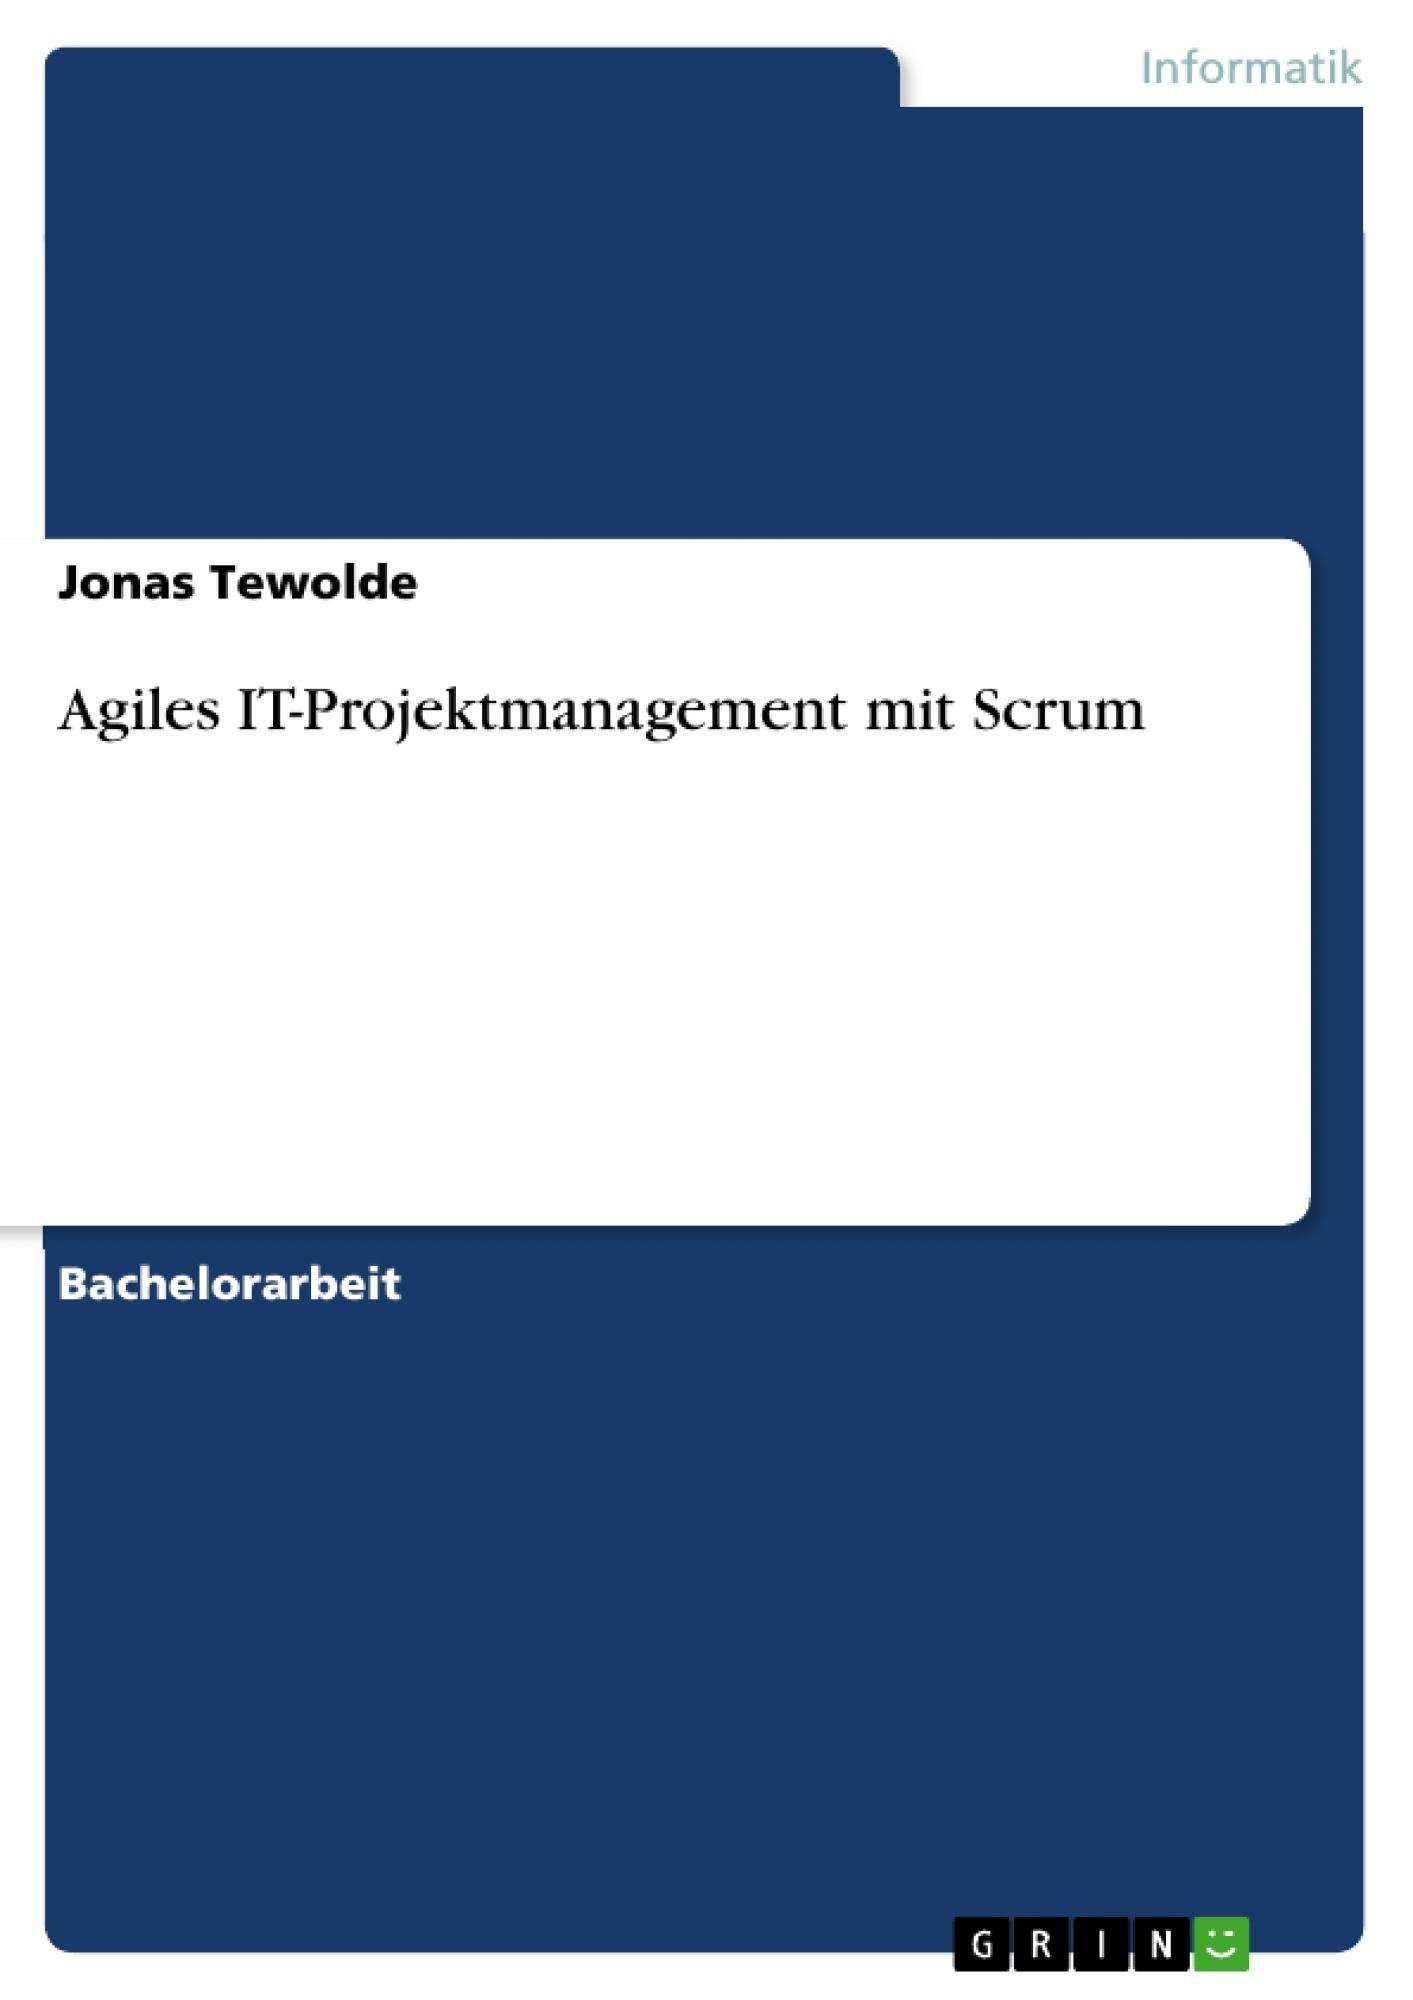 Titel: Agiles IT-Projektmanagement mit Scrum